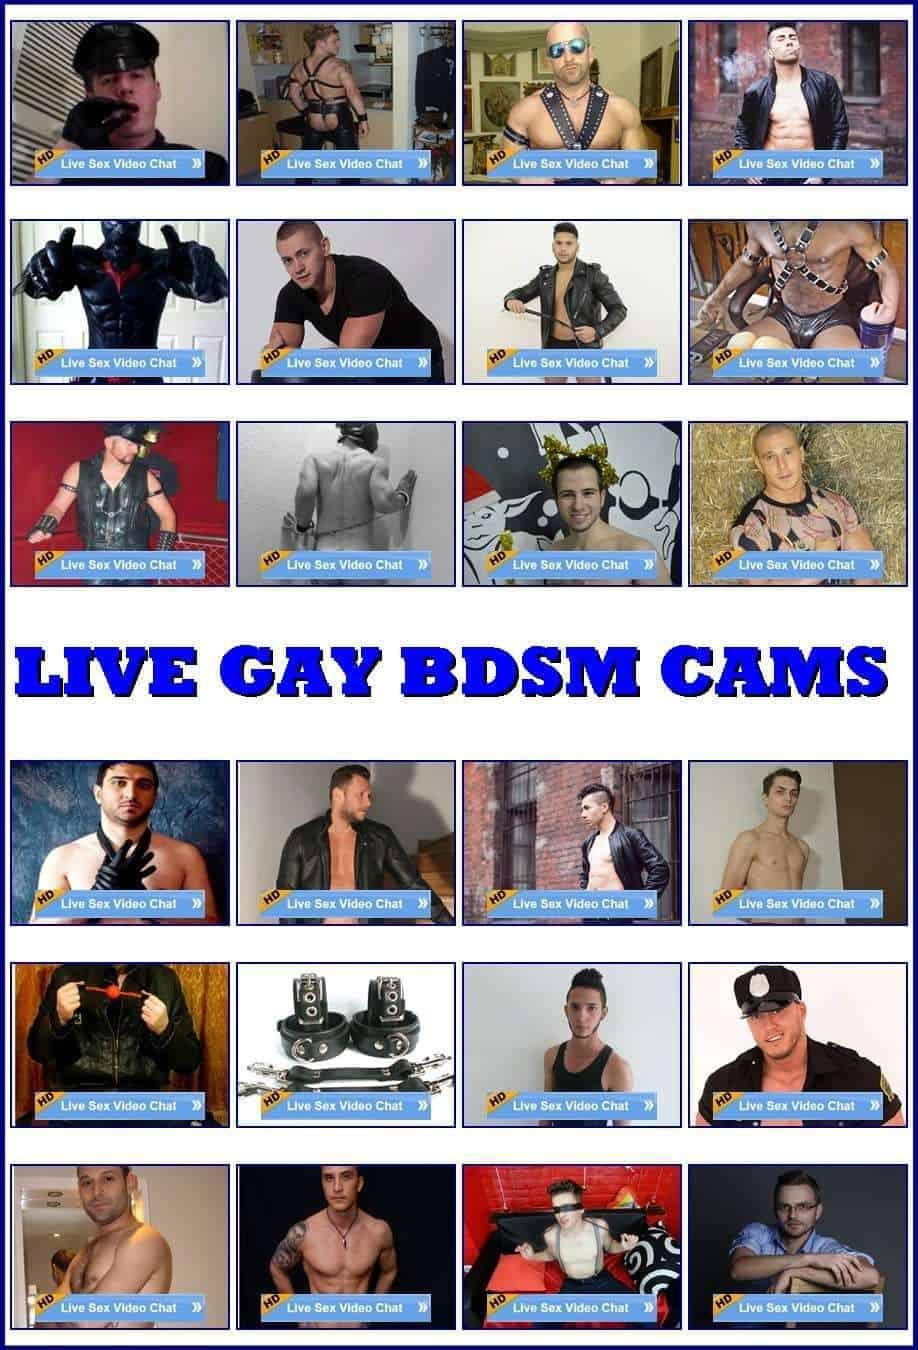 Live gay sex video